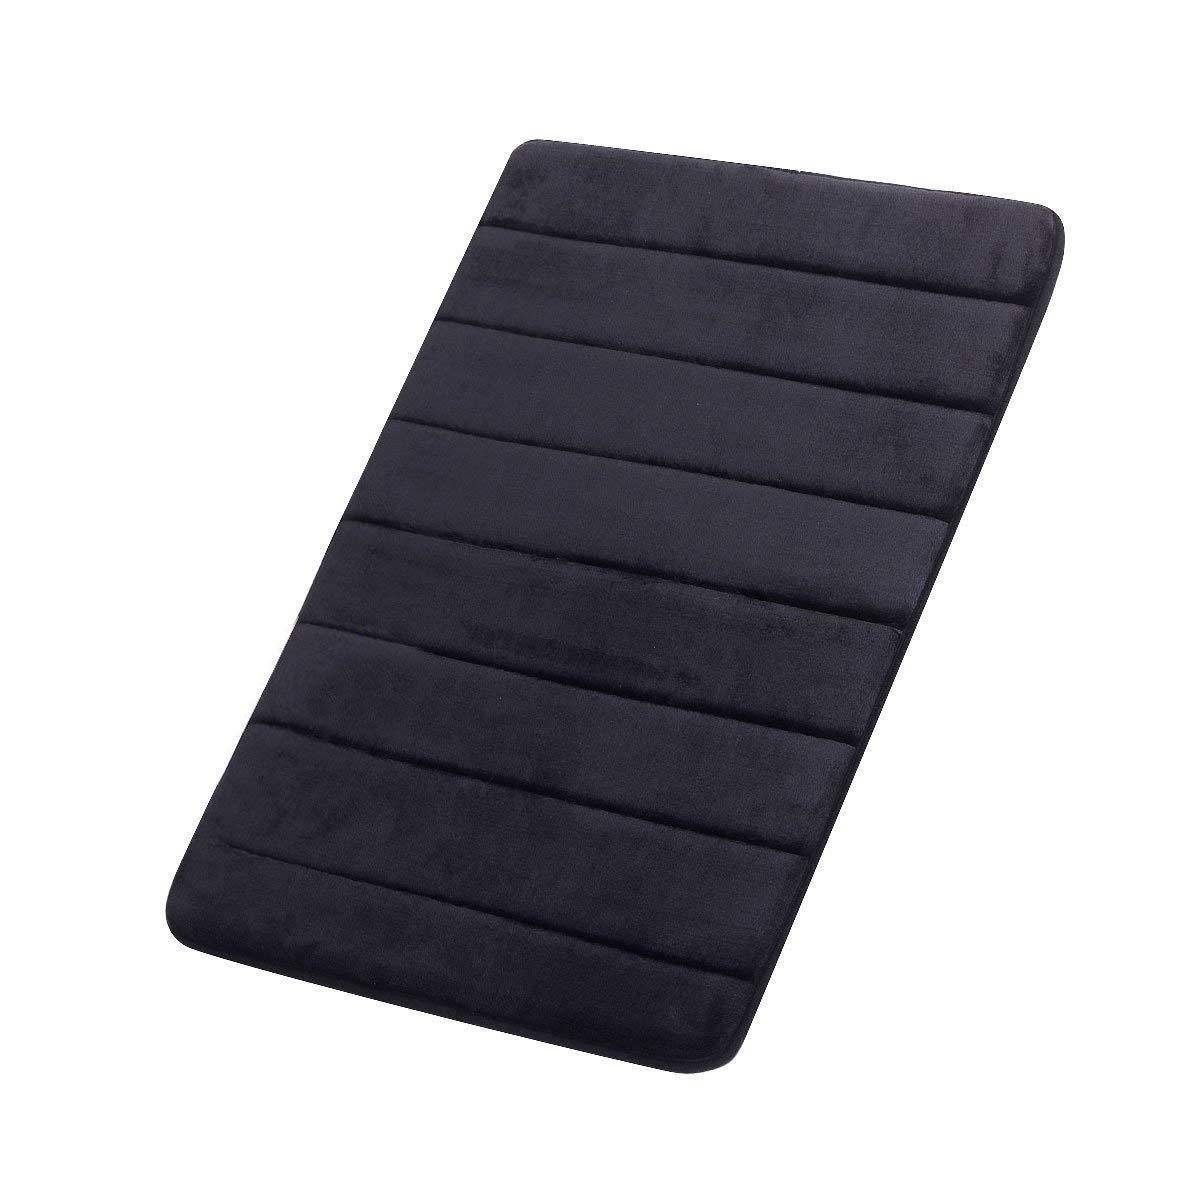 FINDNEW Non-Slip Soft Microfiber Memory Foam Bath Mat,Toilet Bath Rug,with Anti-Skid Bottom Washable Quickly Drying Bathroom mats (20'' X 32'', Black) by FINDNEW